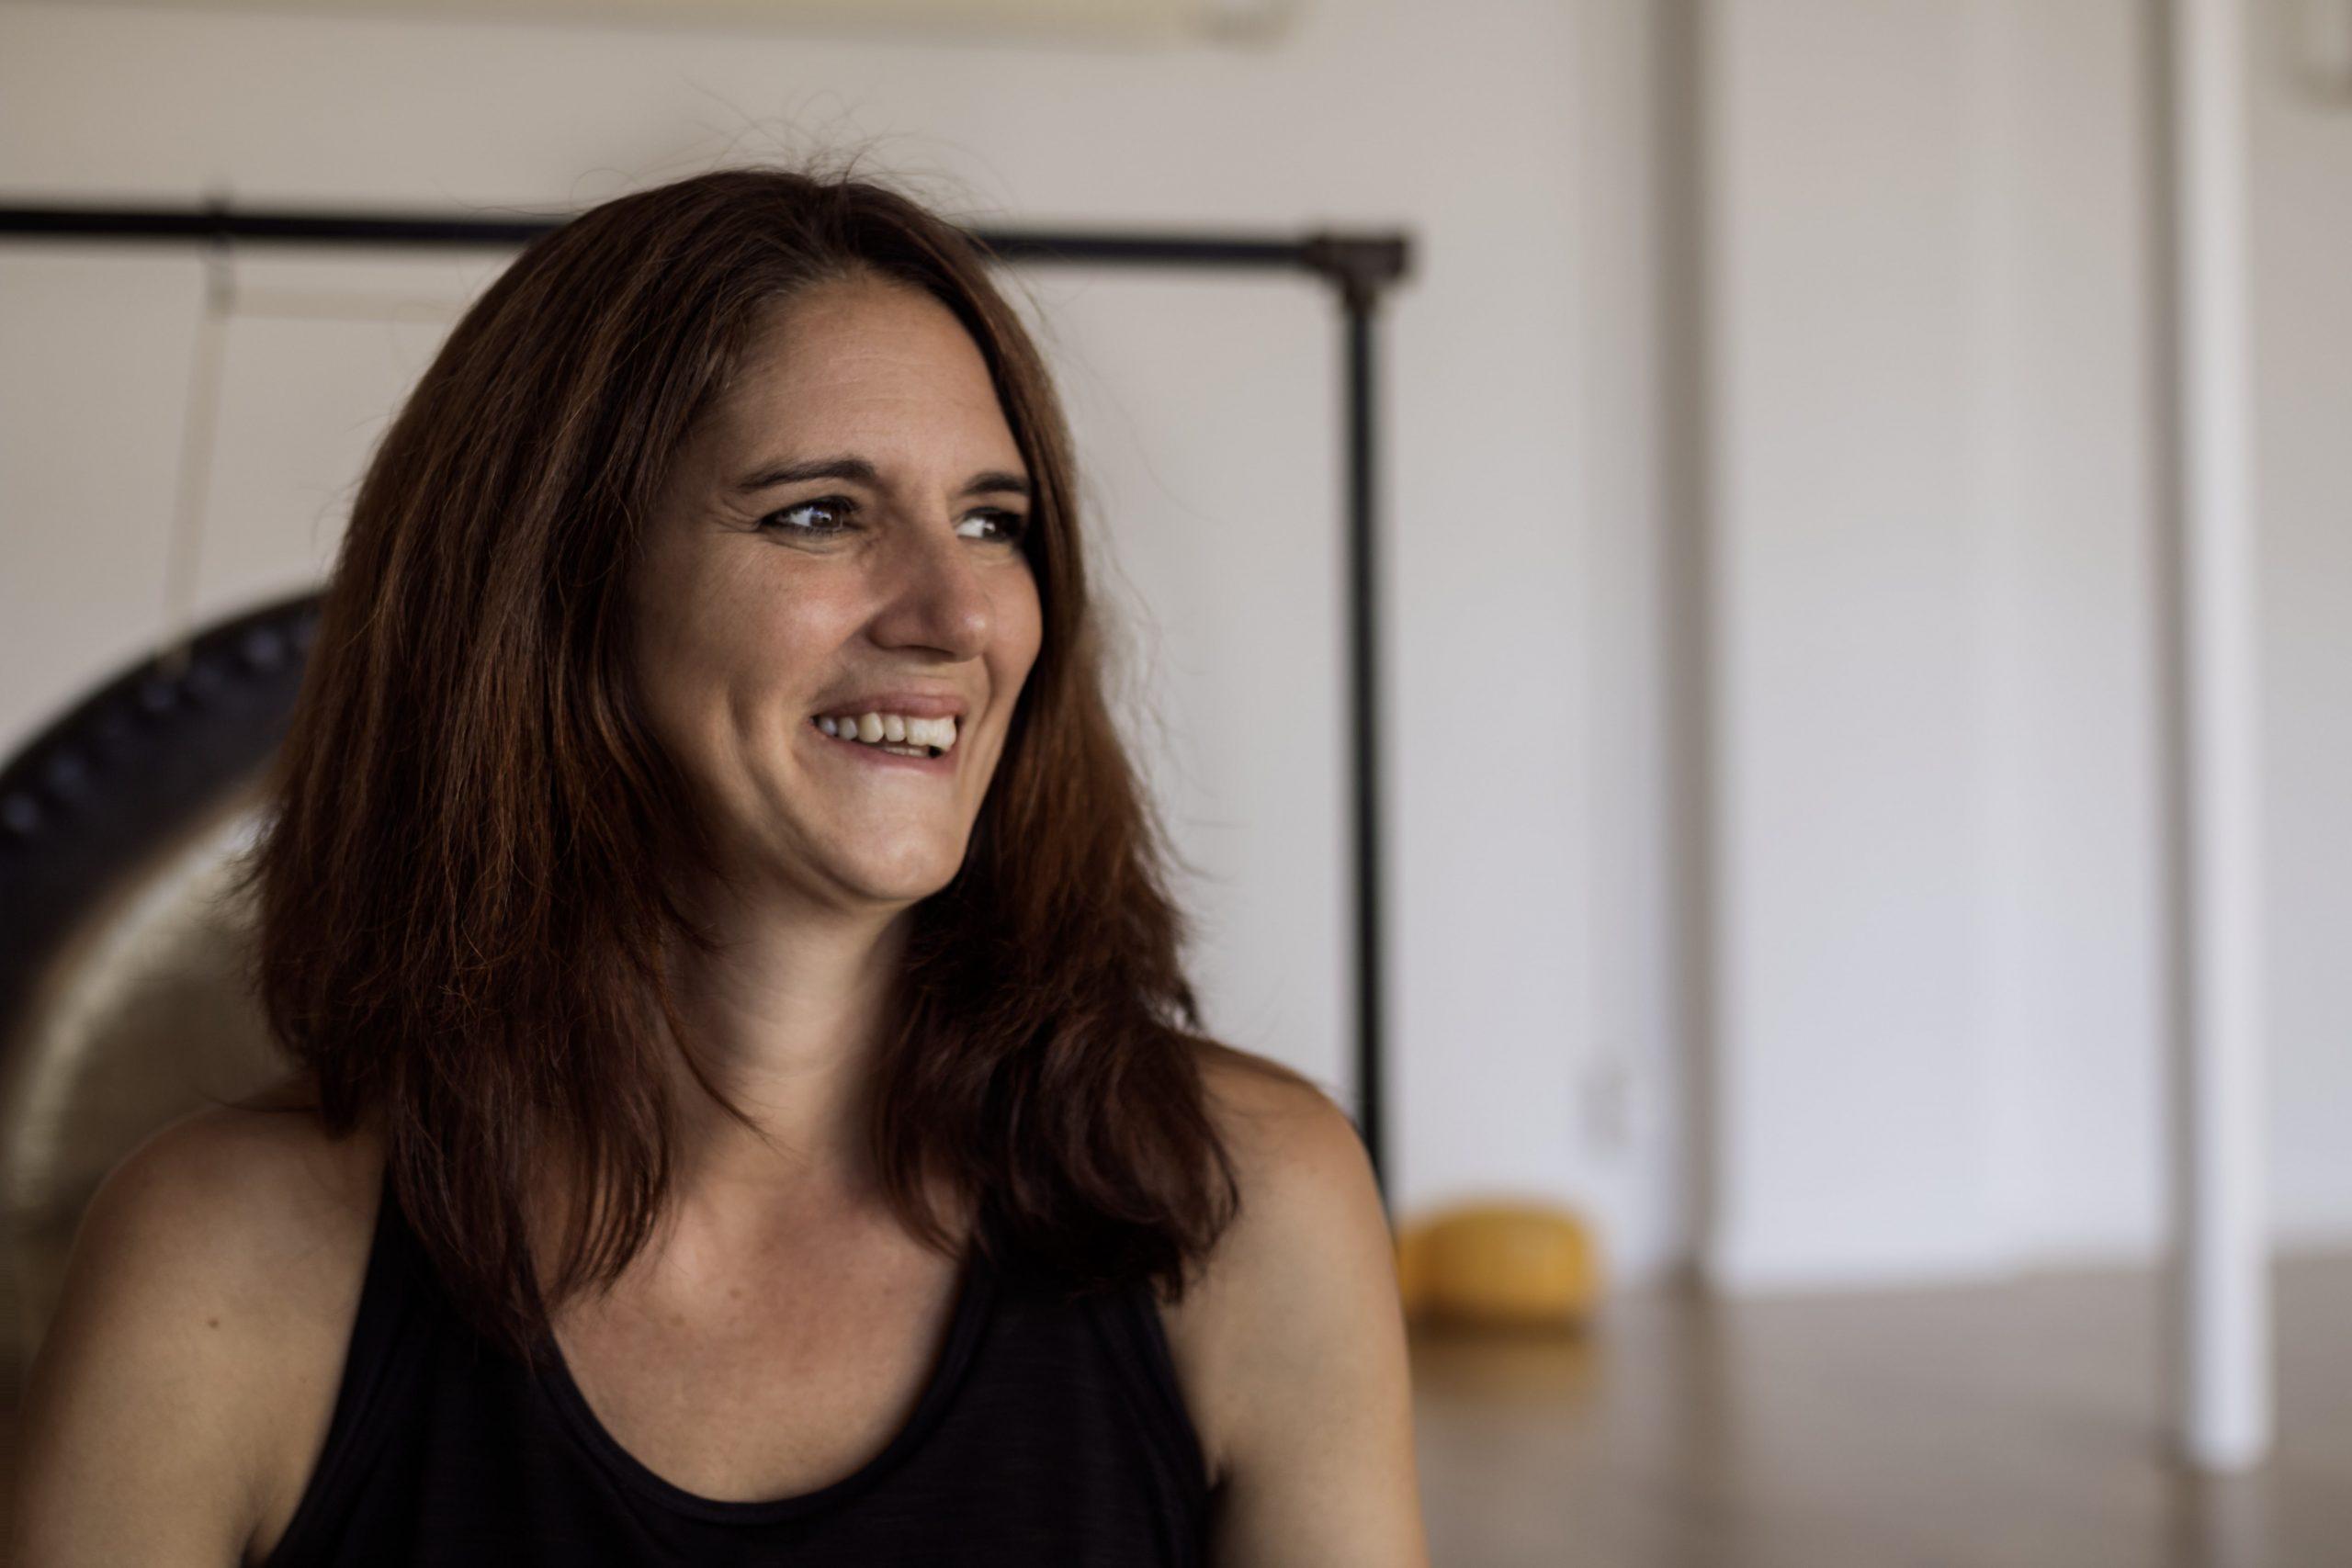 Simone Mülbert (Inhaberin Yoga Inspirit in Wiesenbach)